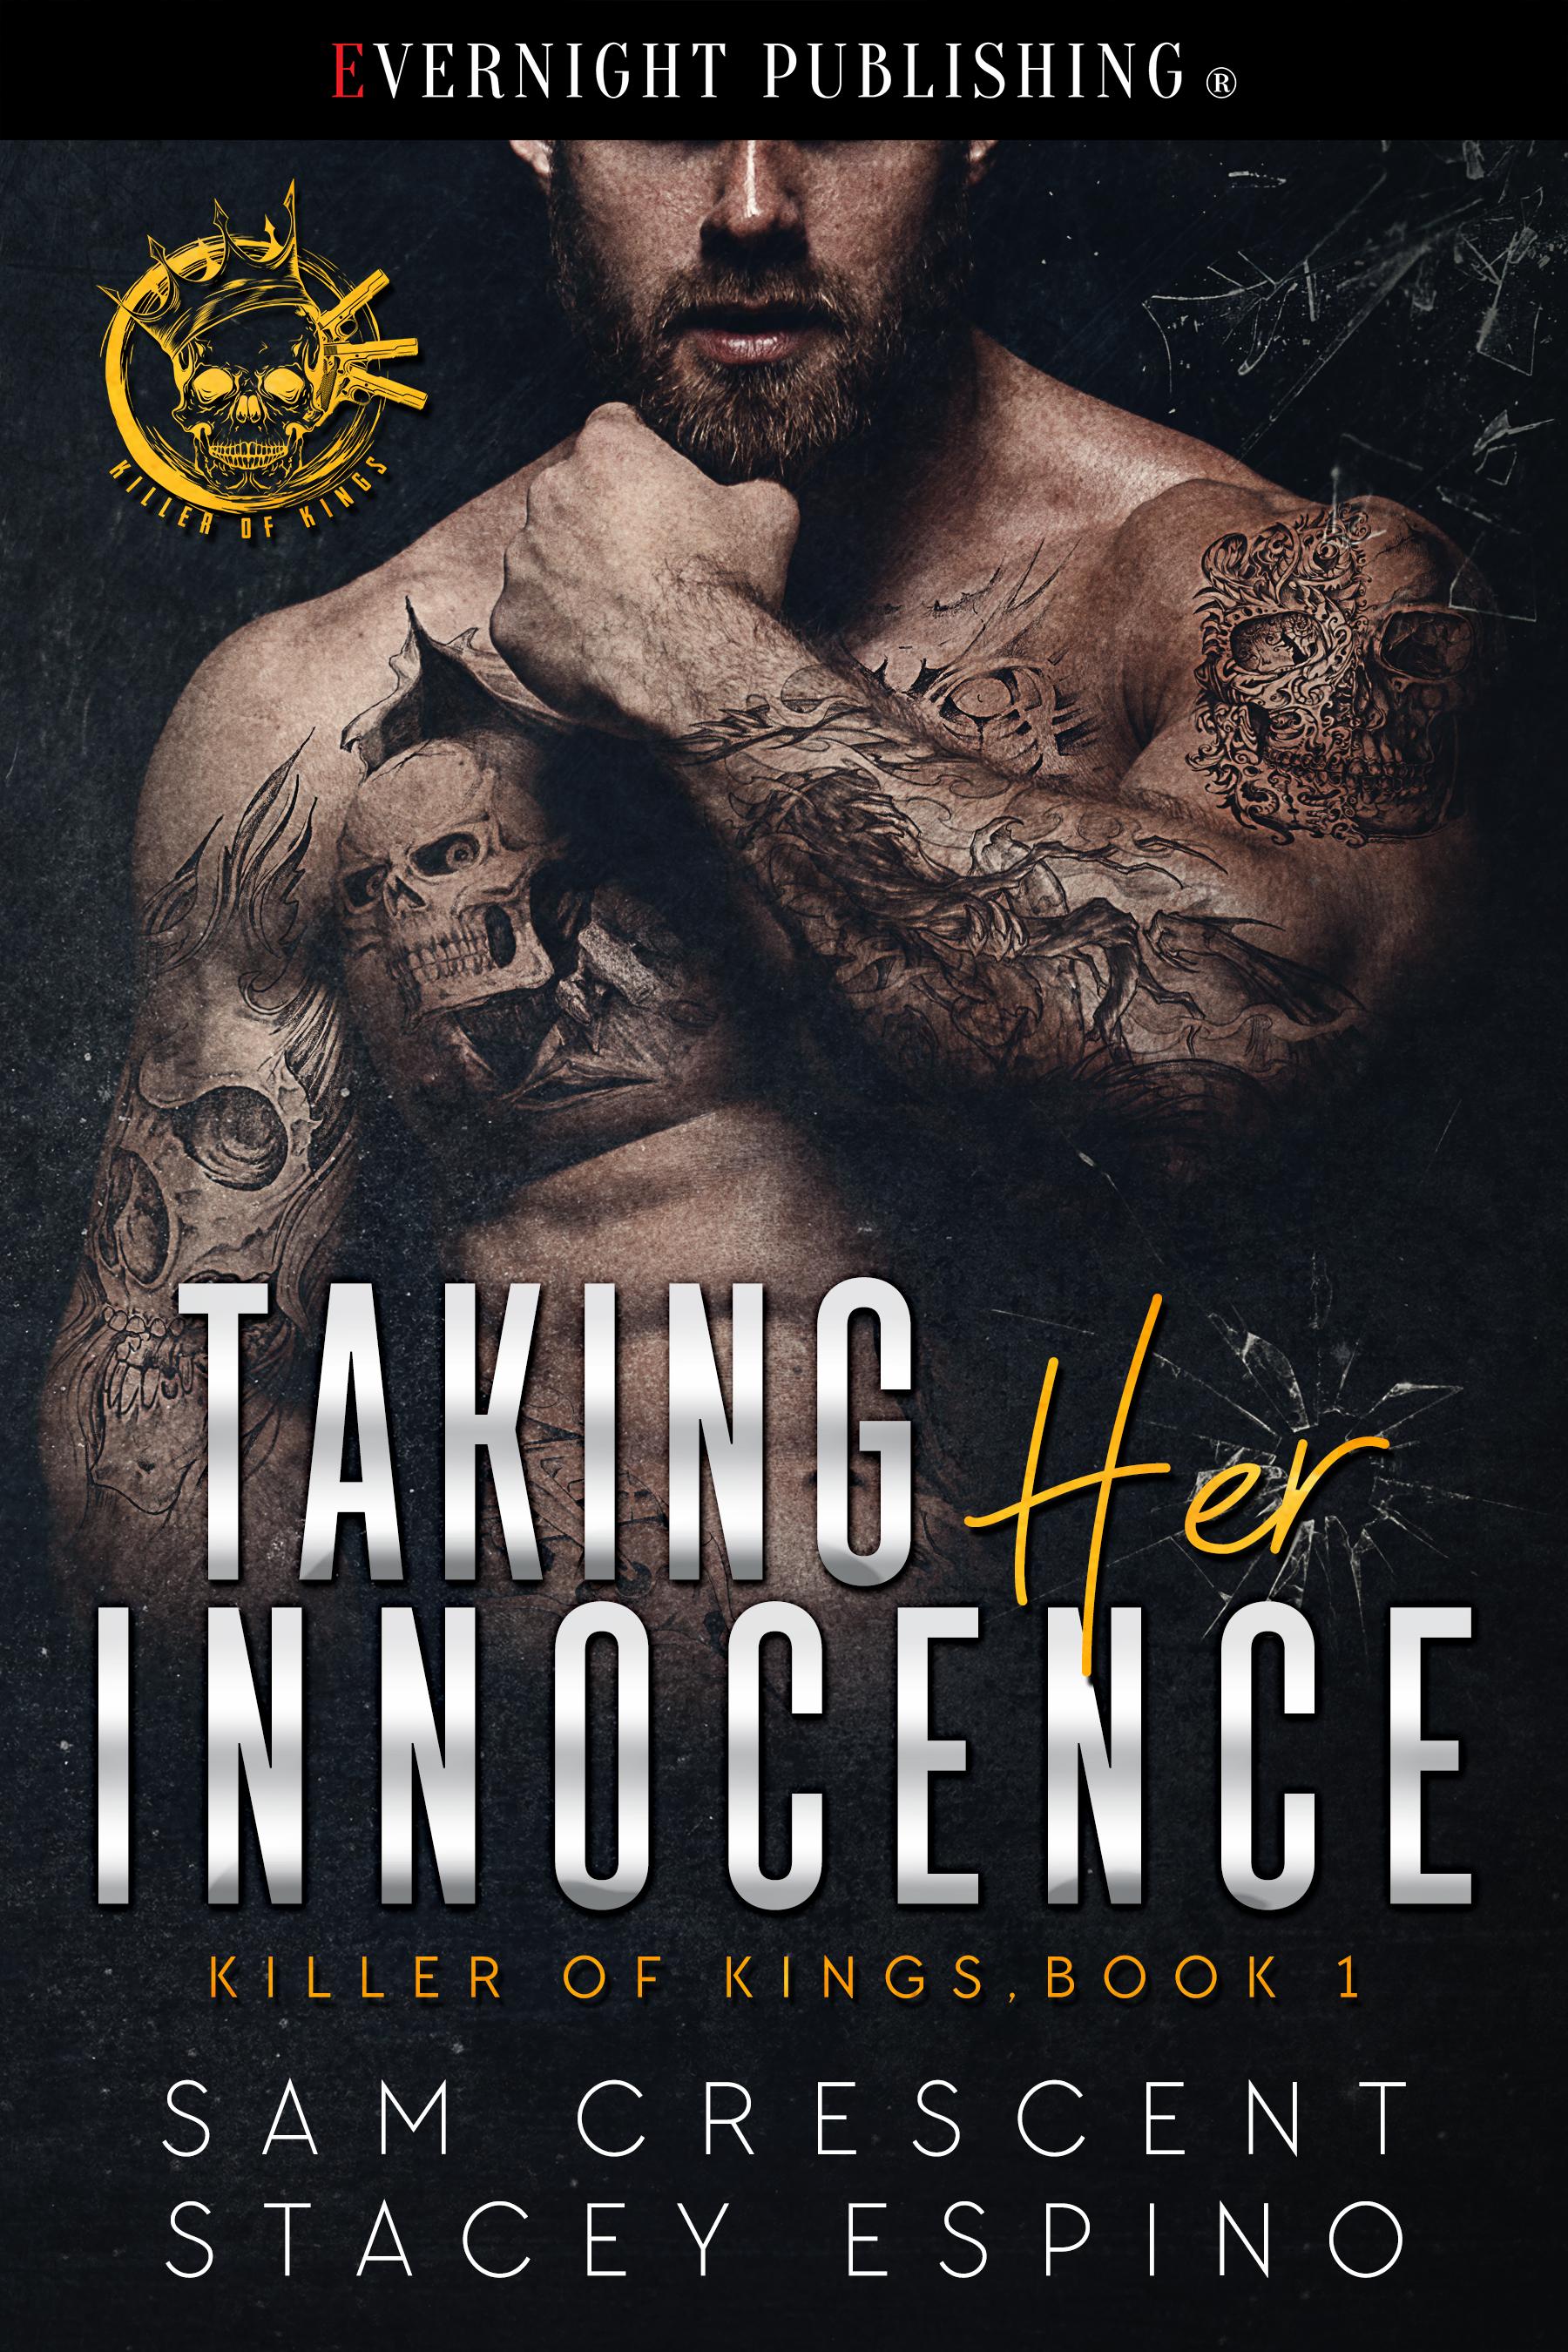 Taking-Her-Innocence-evernightpublishing-2017-ebook2